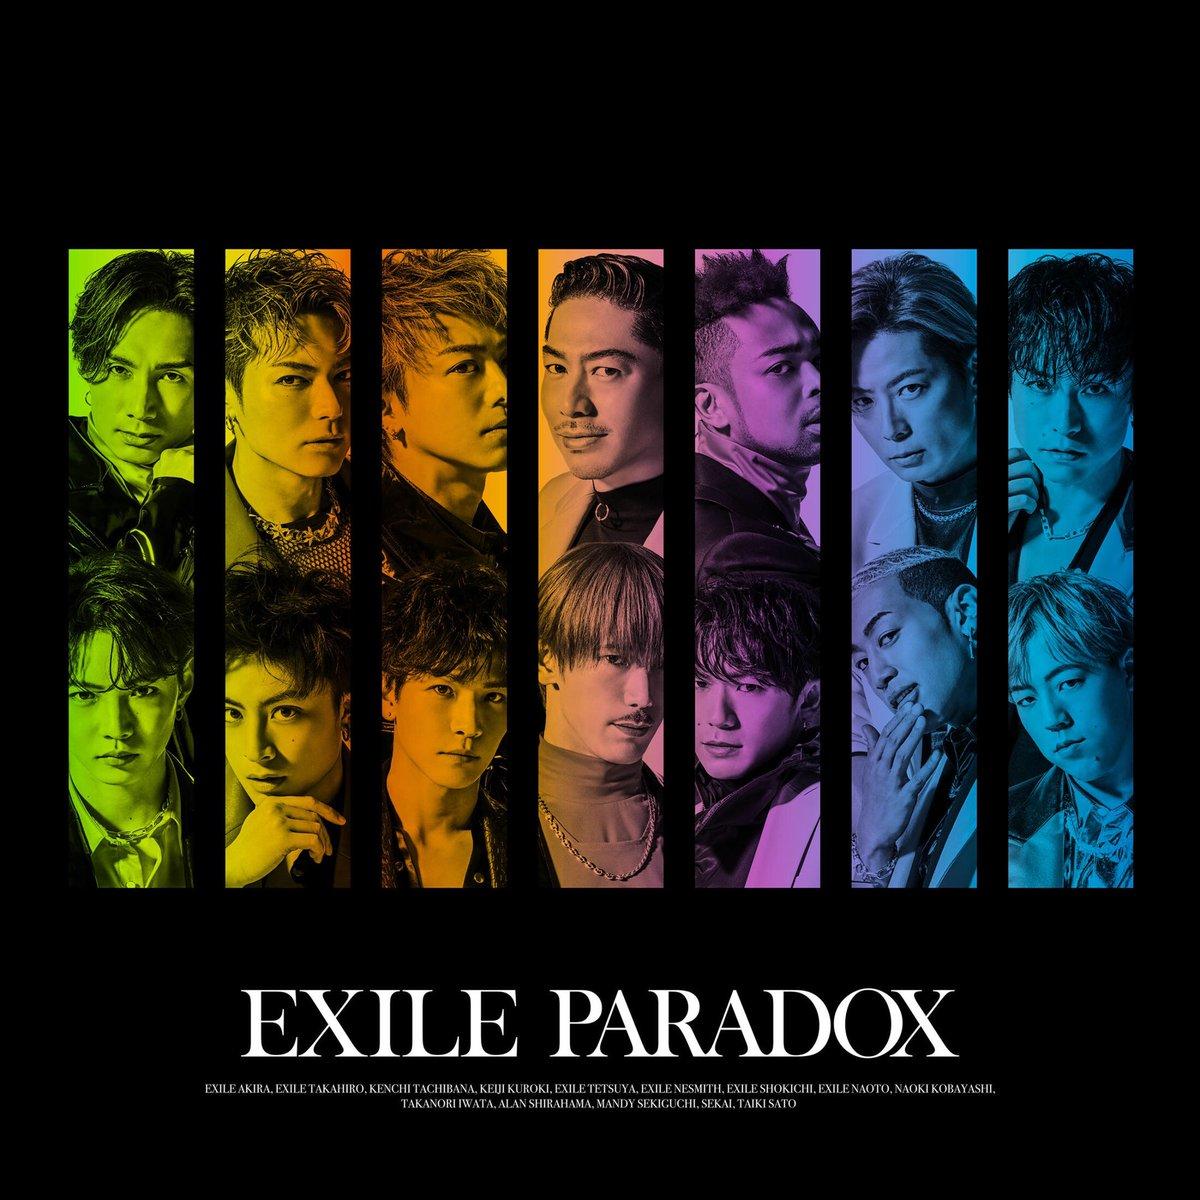 『EXILE - PARADOX』収録の『PARADOX』ジャケット